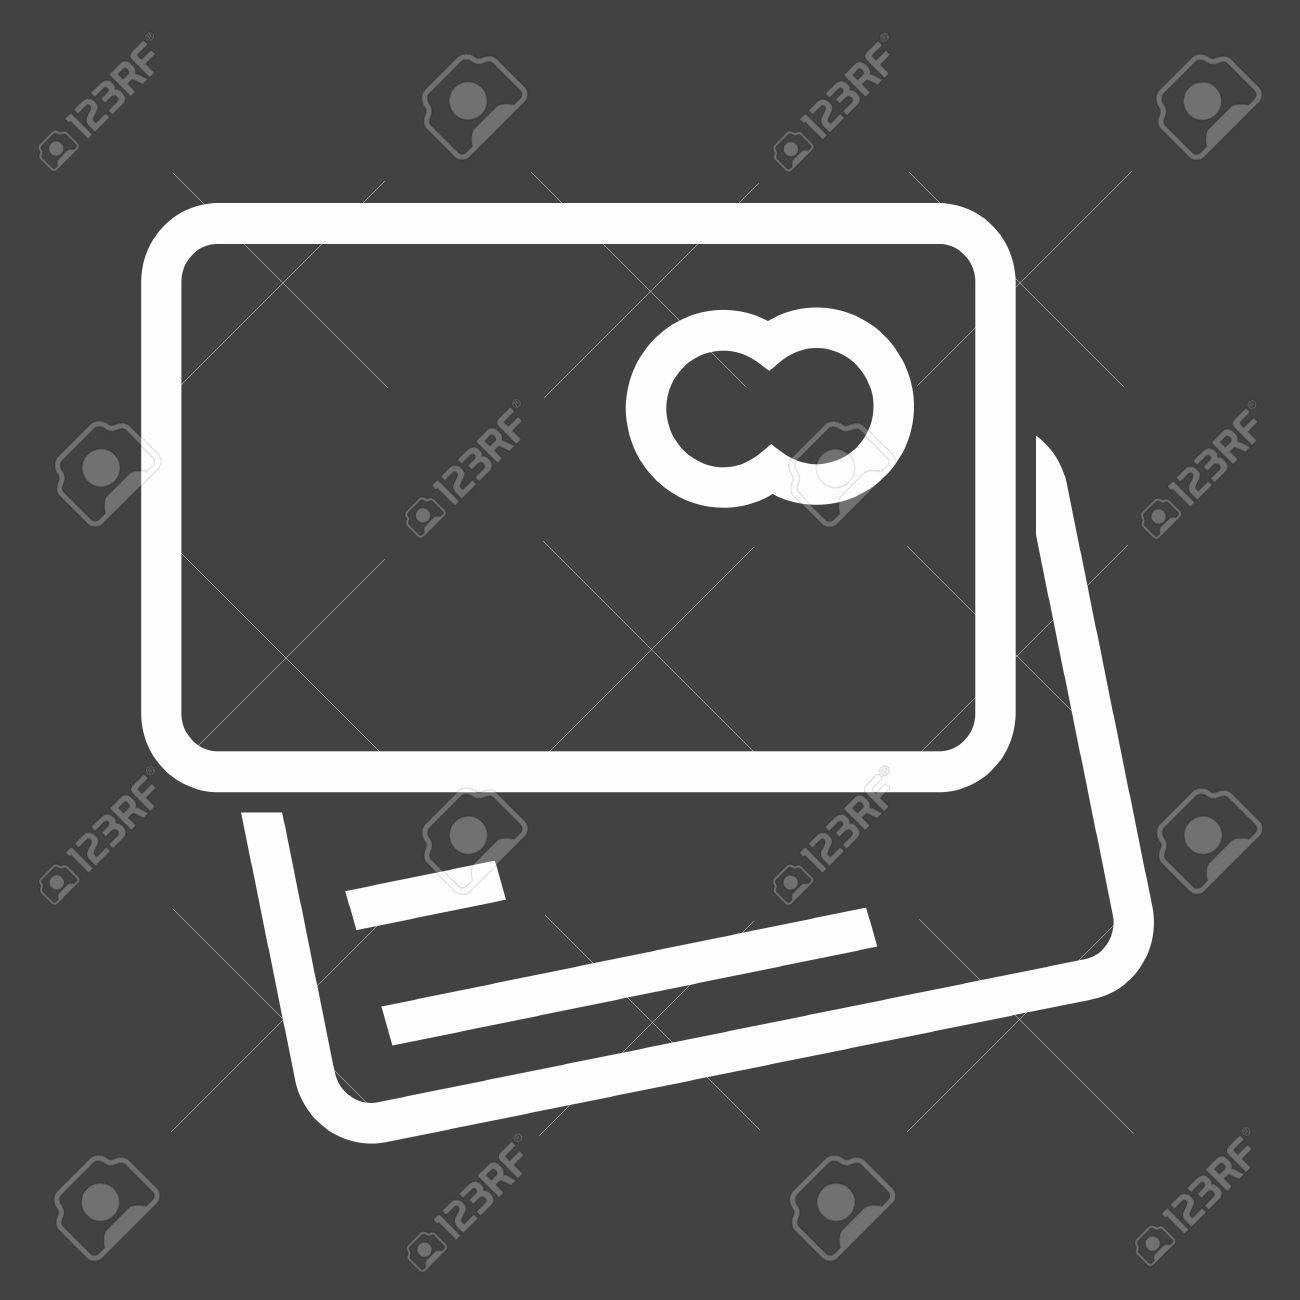 Card Credit Debit Card Visa Card Icon Vector Image Can Also